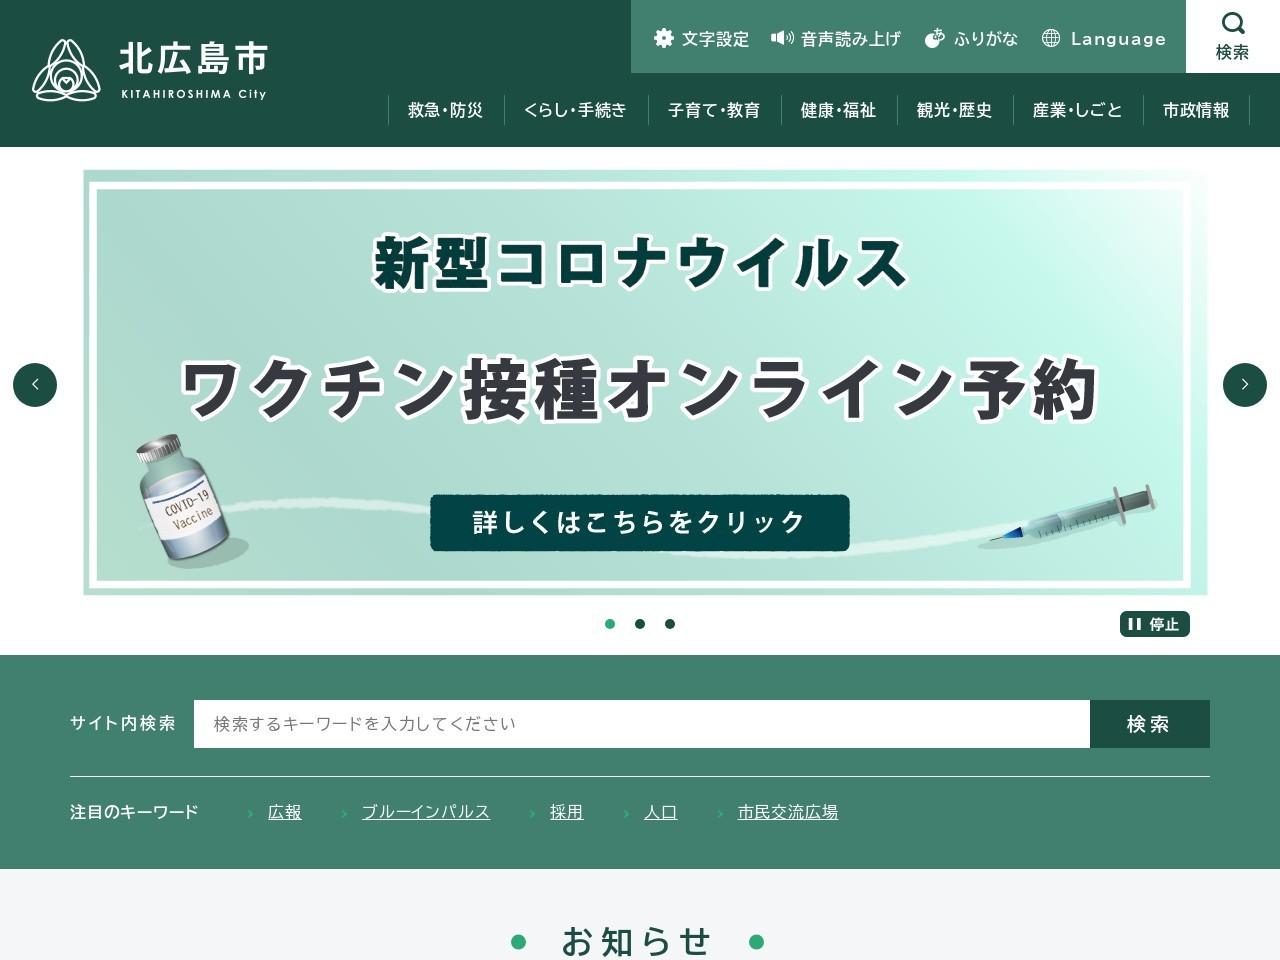 http://www.city.kitahiroshima.hokkaido.jp/hotnews/detail/00000320.html